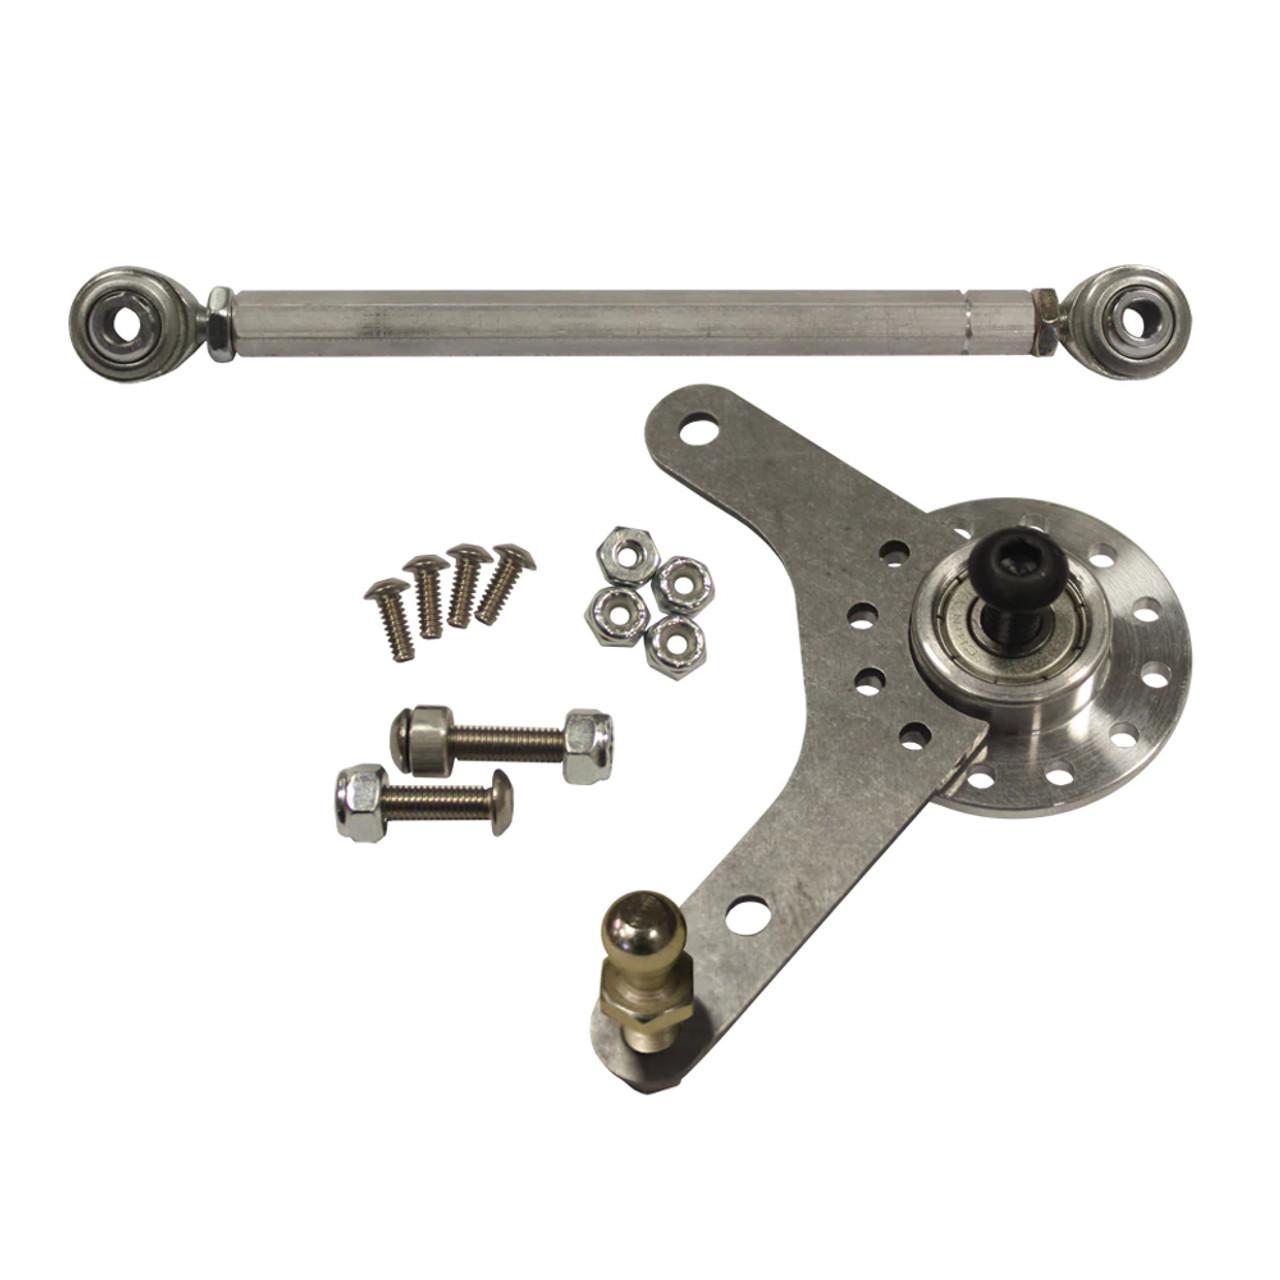 medium resolution of single bell crank throttle linkage kit